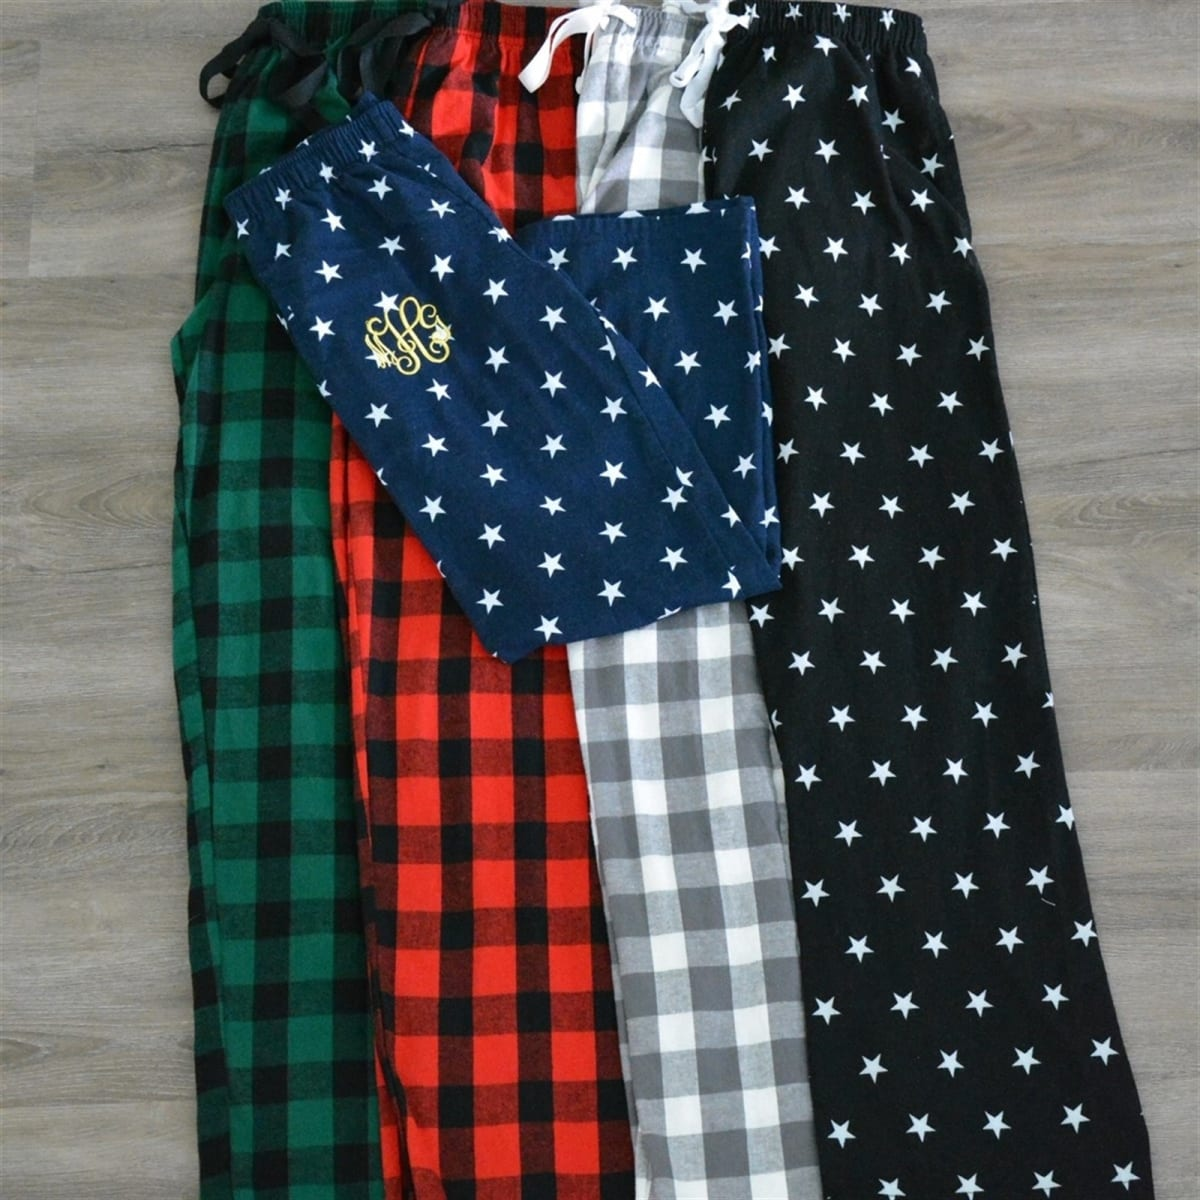 Personalized Matching Pajamas/Lounge Pants! .99 (REG .99) + Free Shipping at Jane!